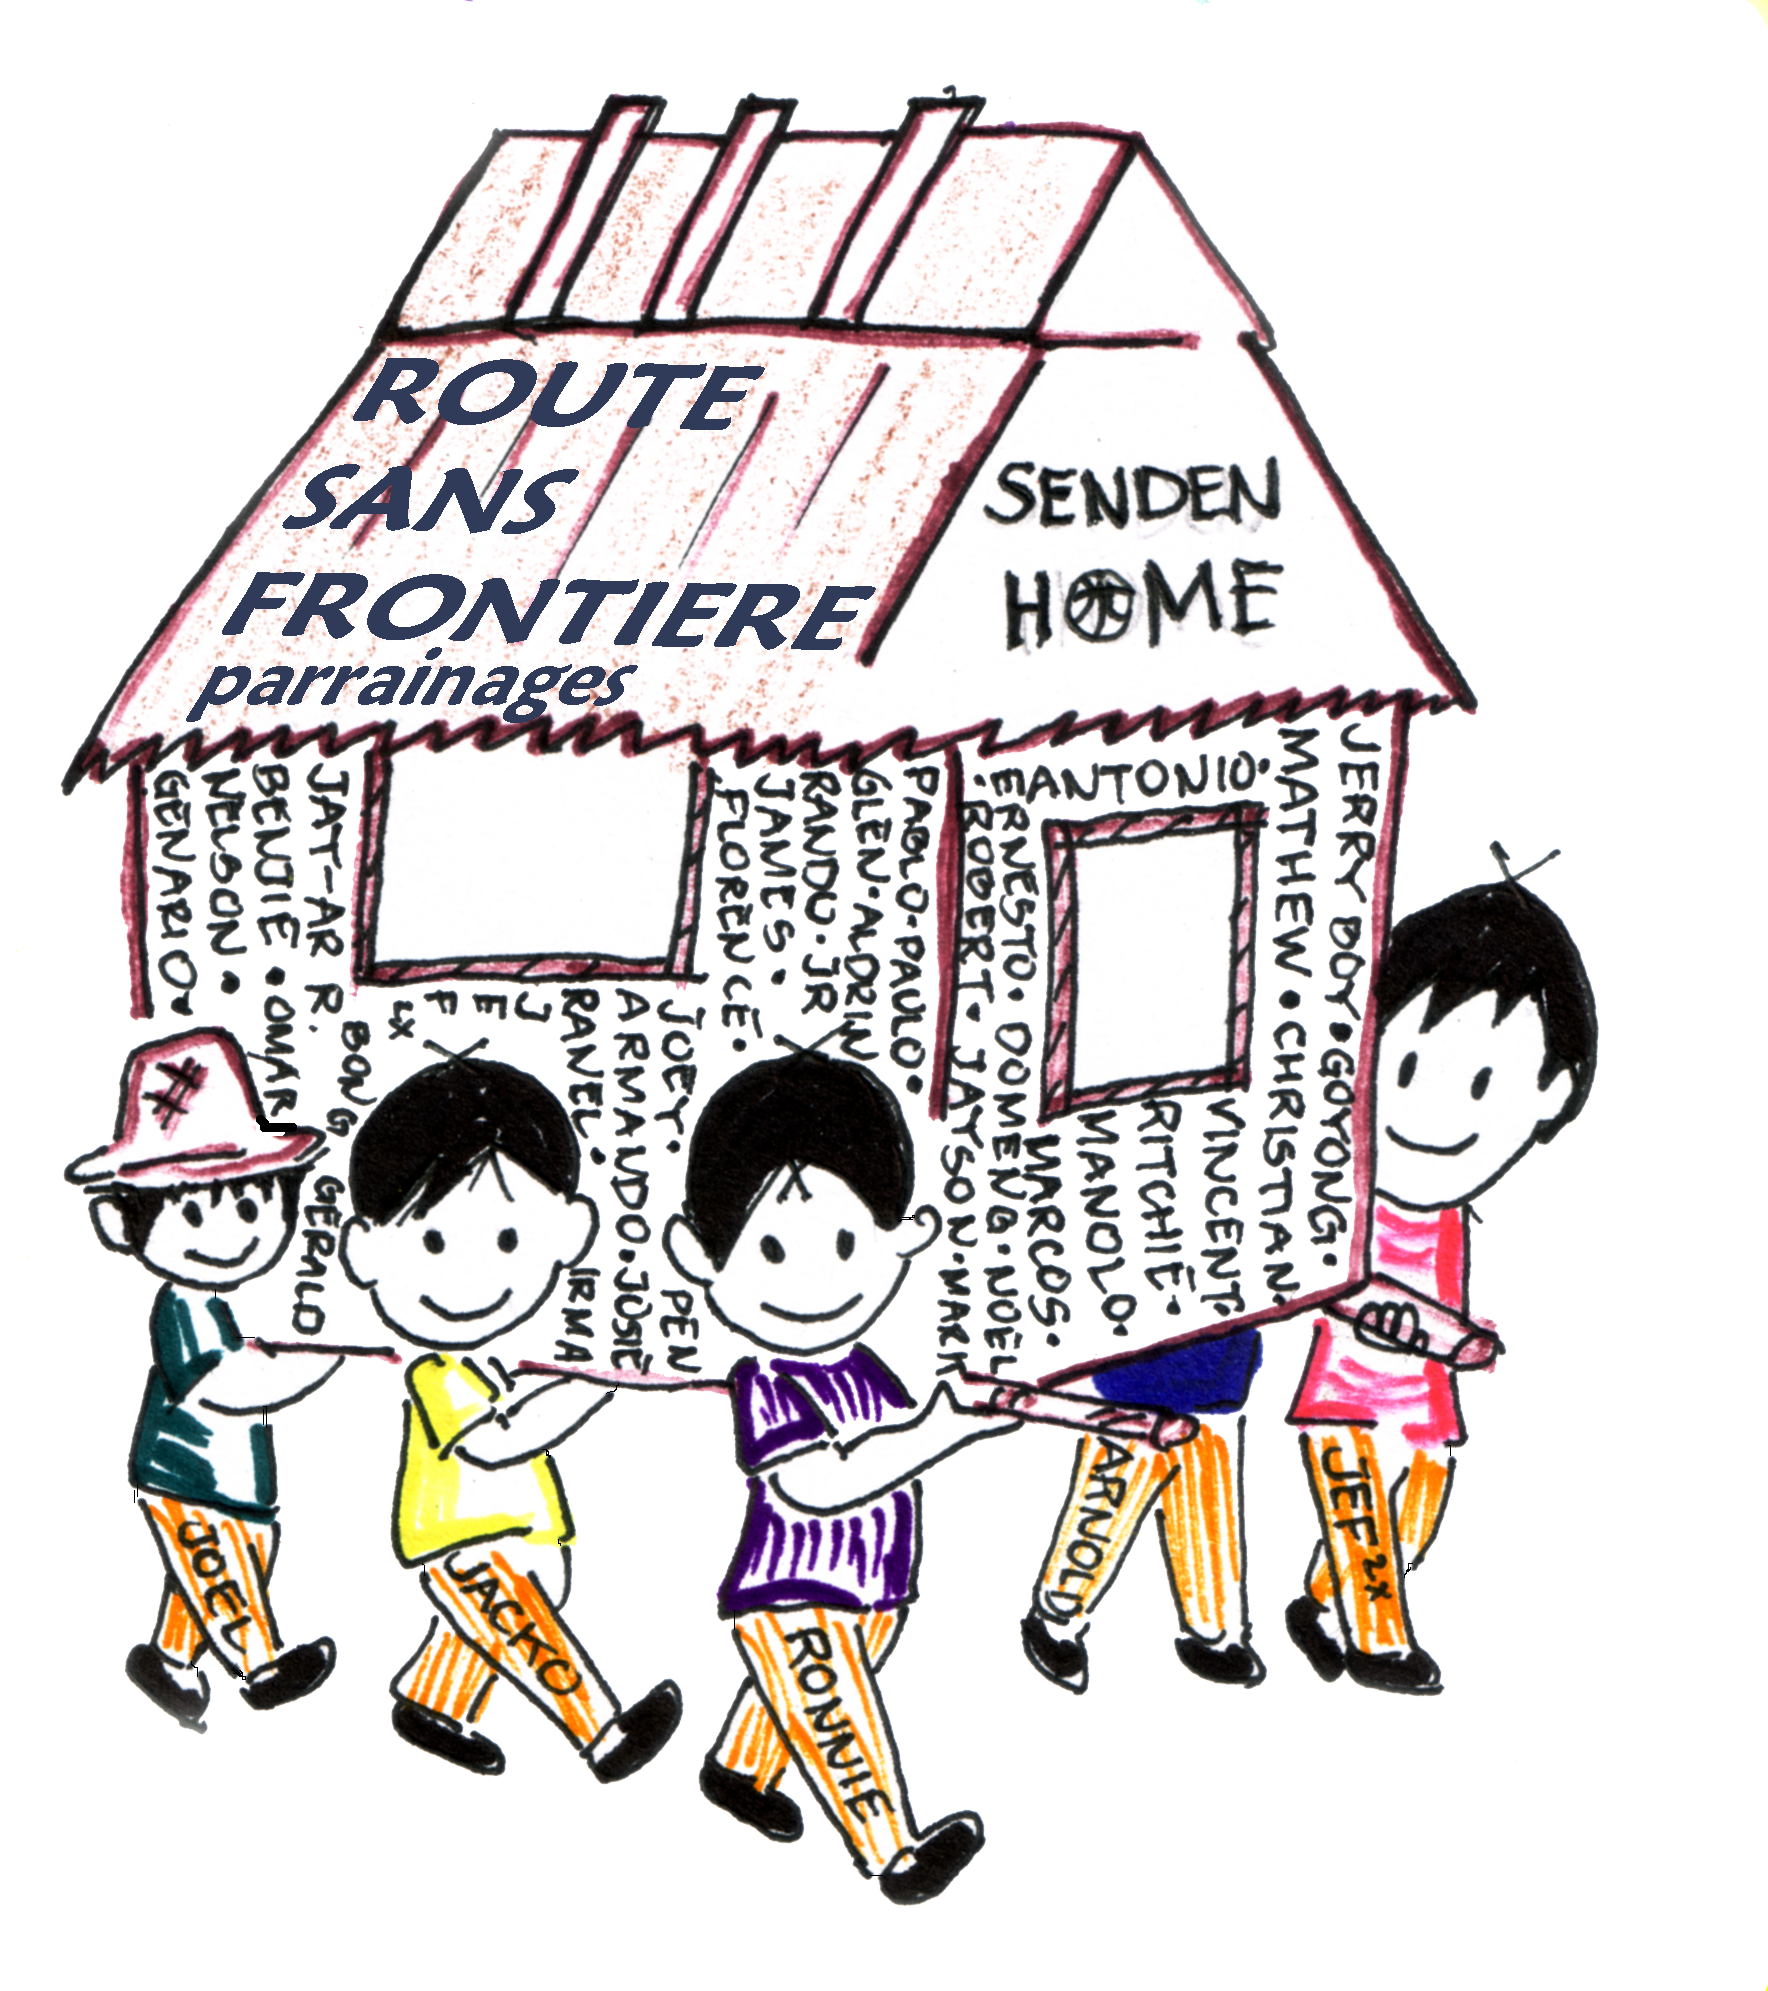 Senden home logotransp. Language clipart independent child